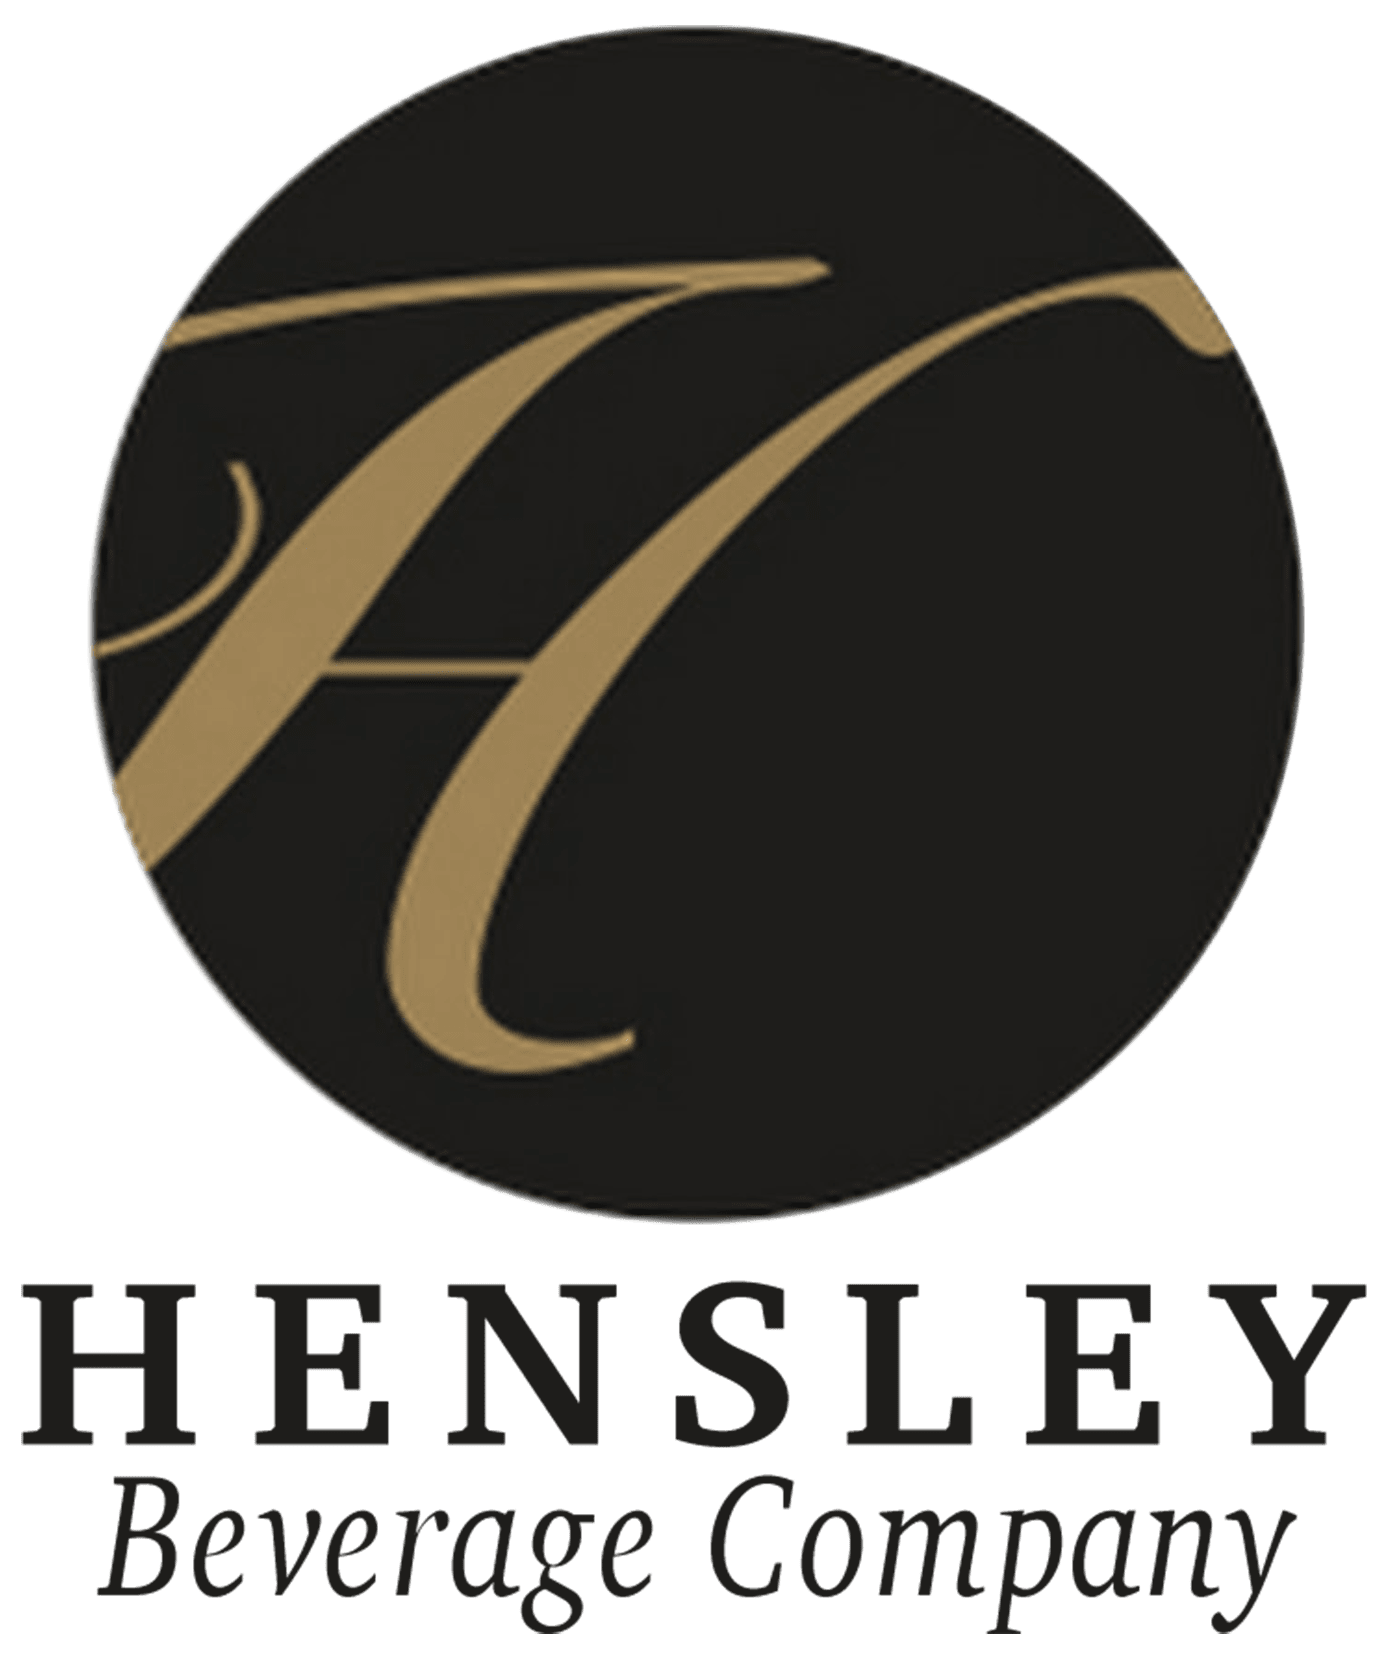 Hensley Beverage Company logo (image)